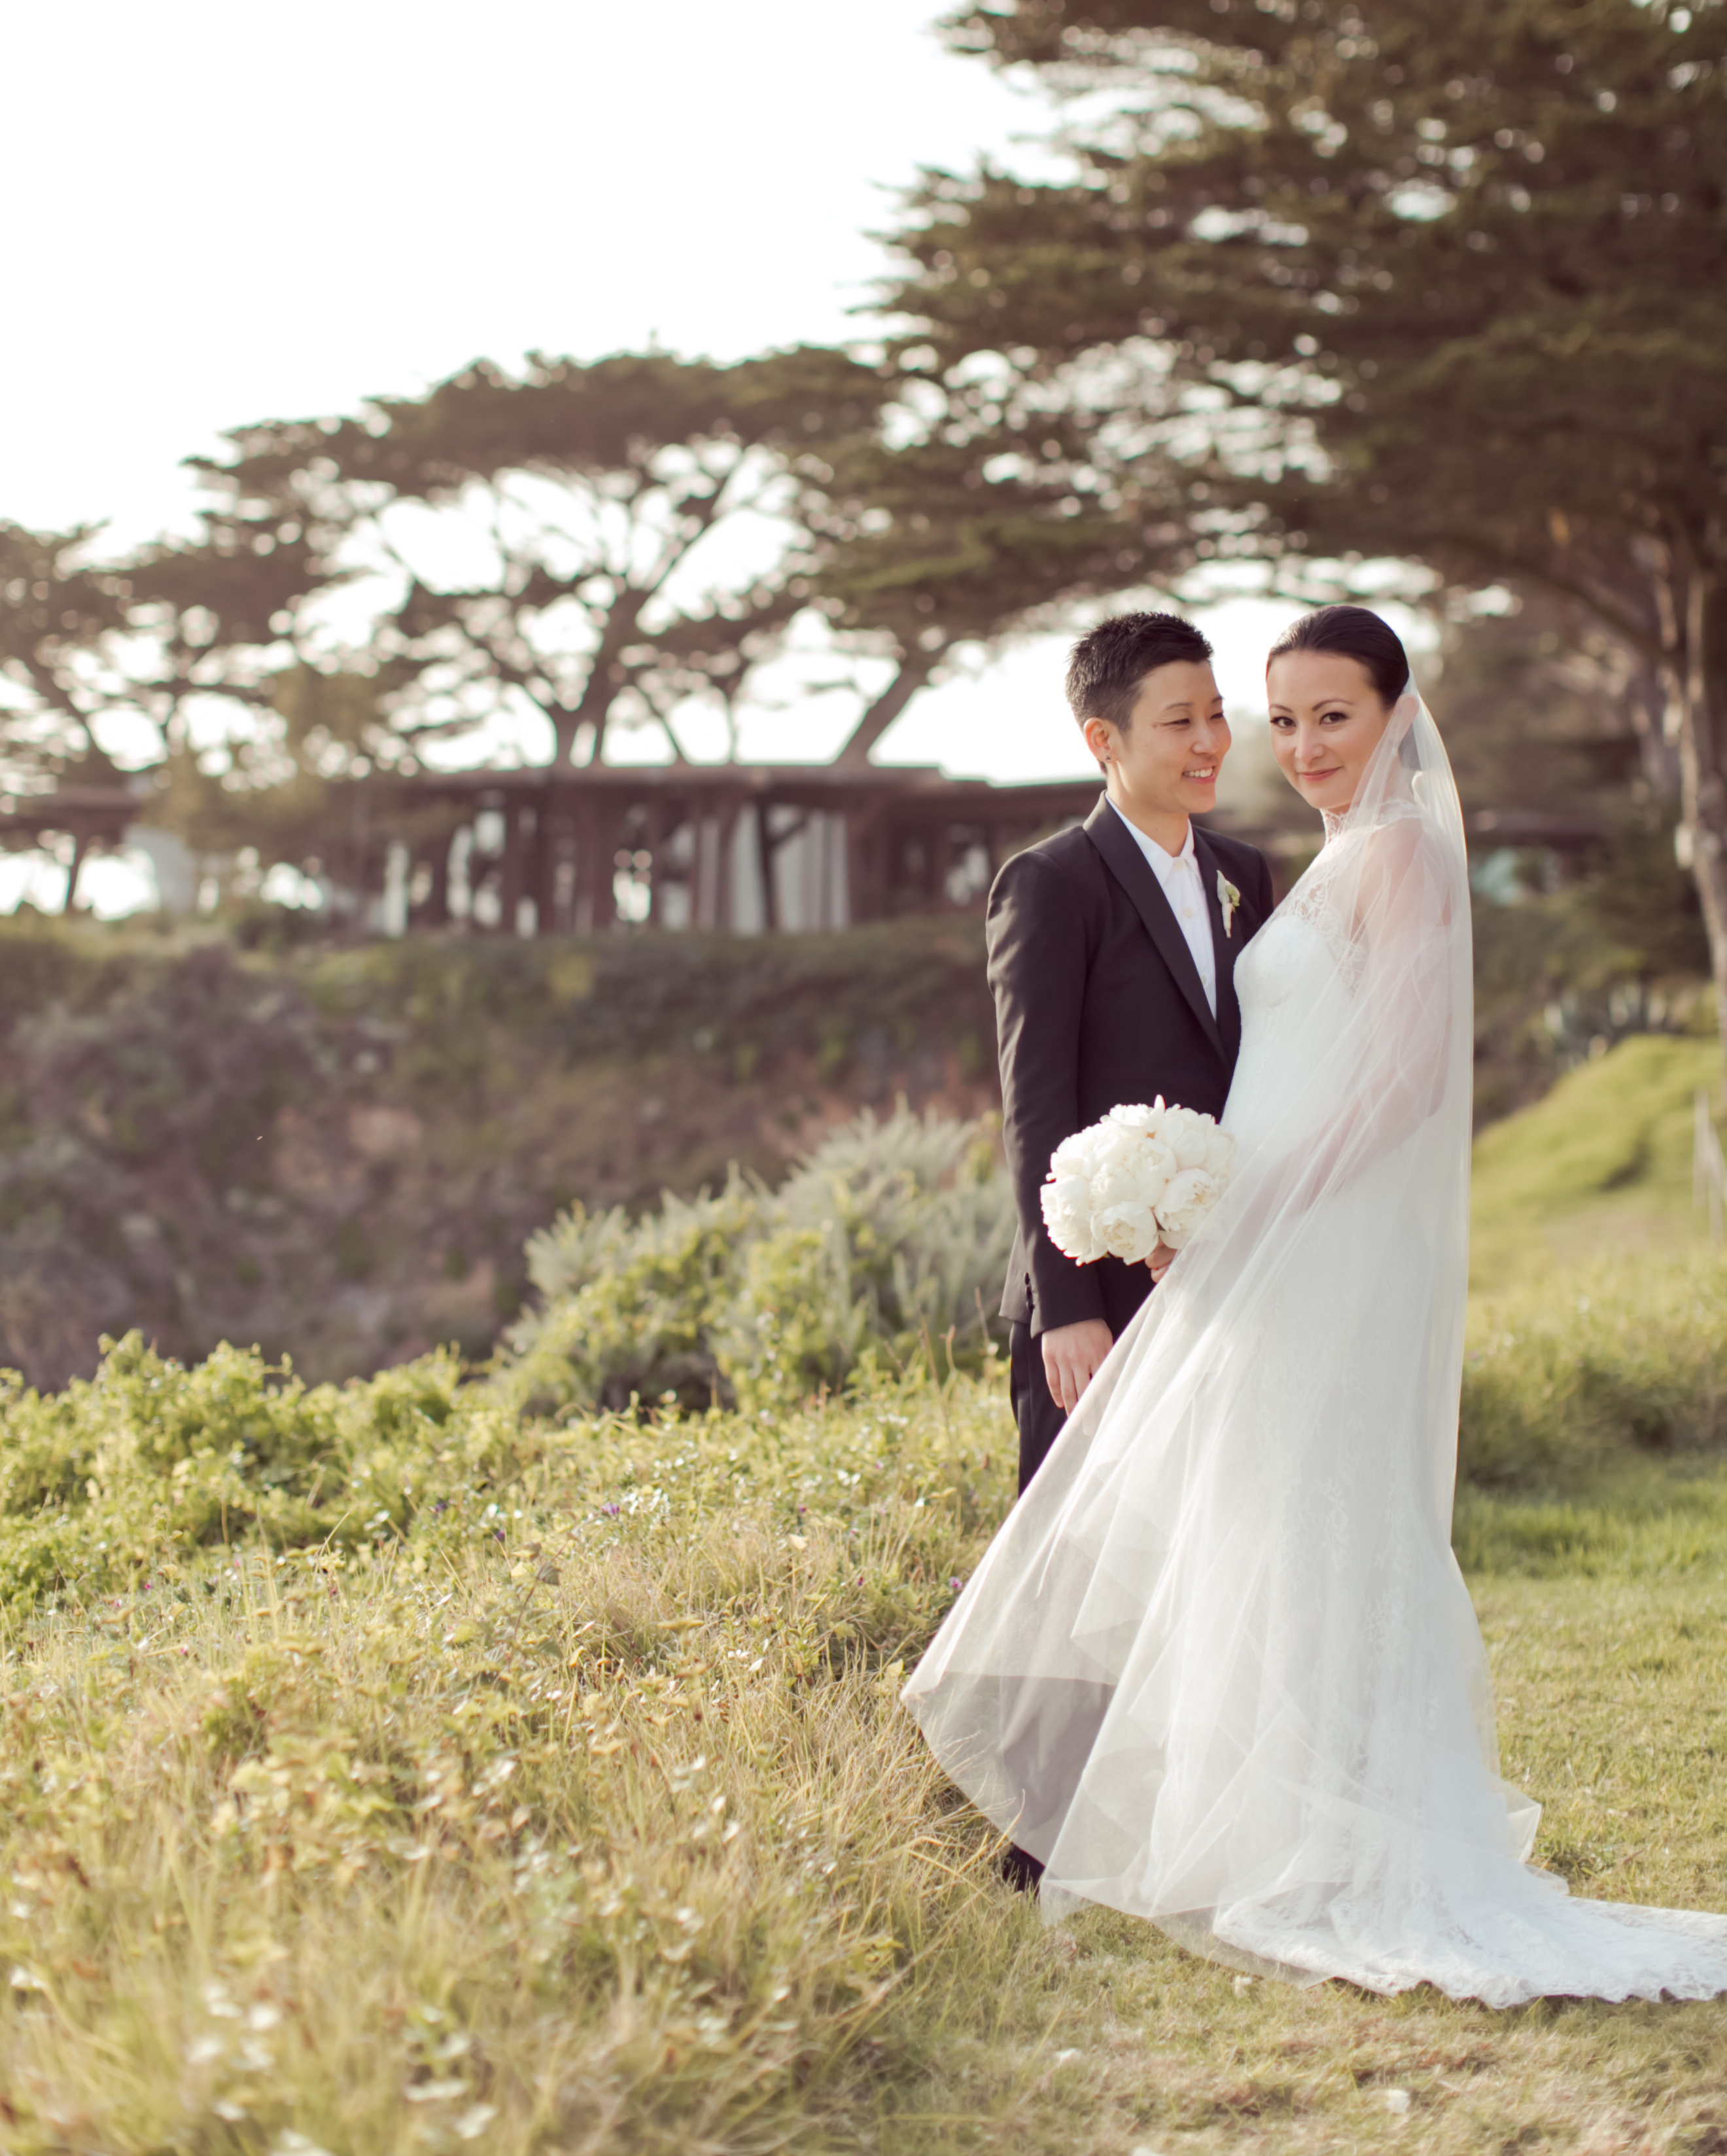 emma-michelle-wedding-couple-1029-s112079-0715.jpg